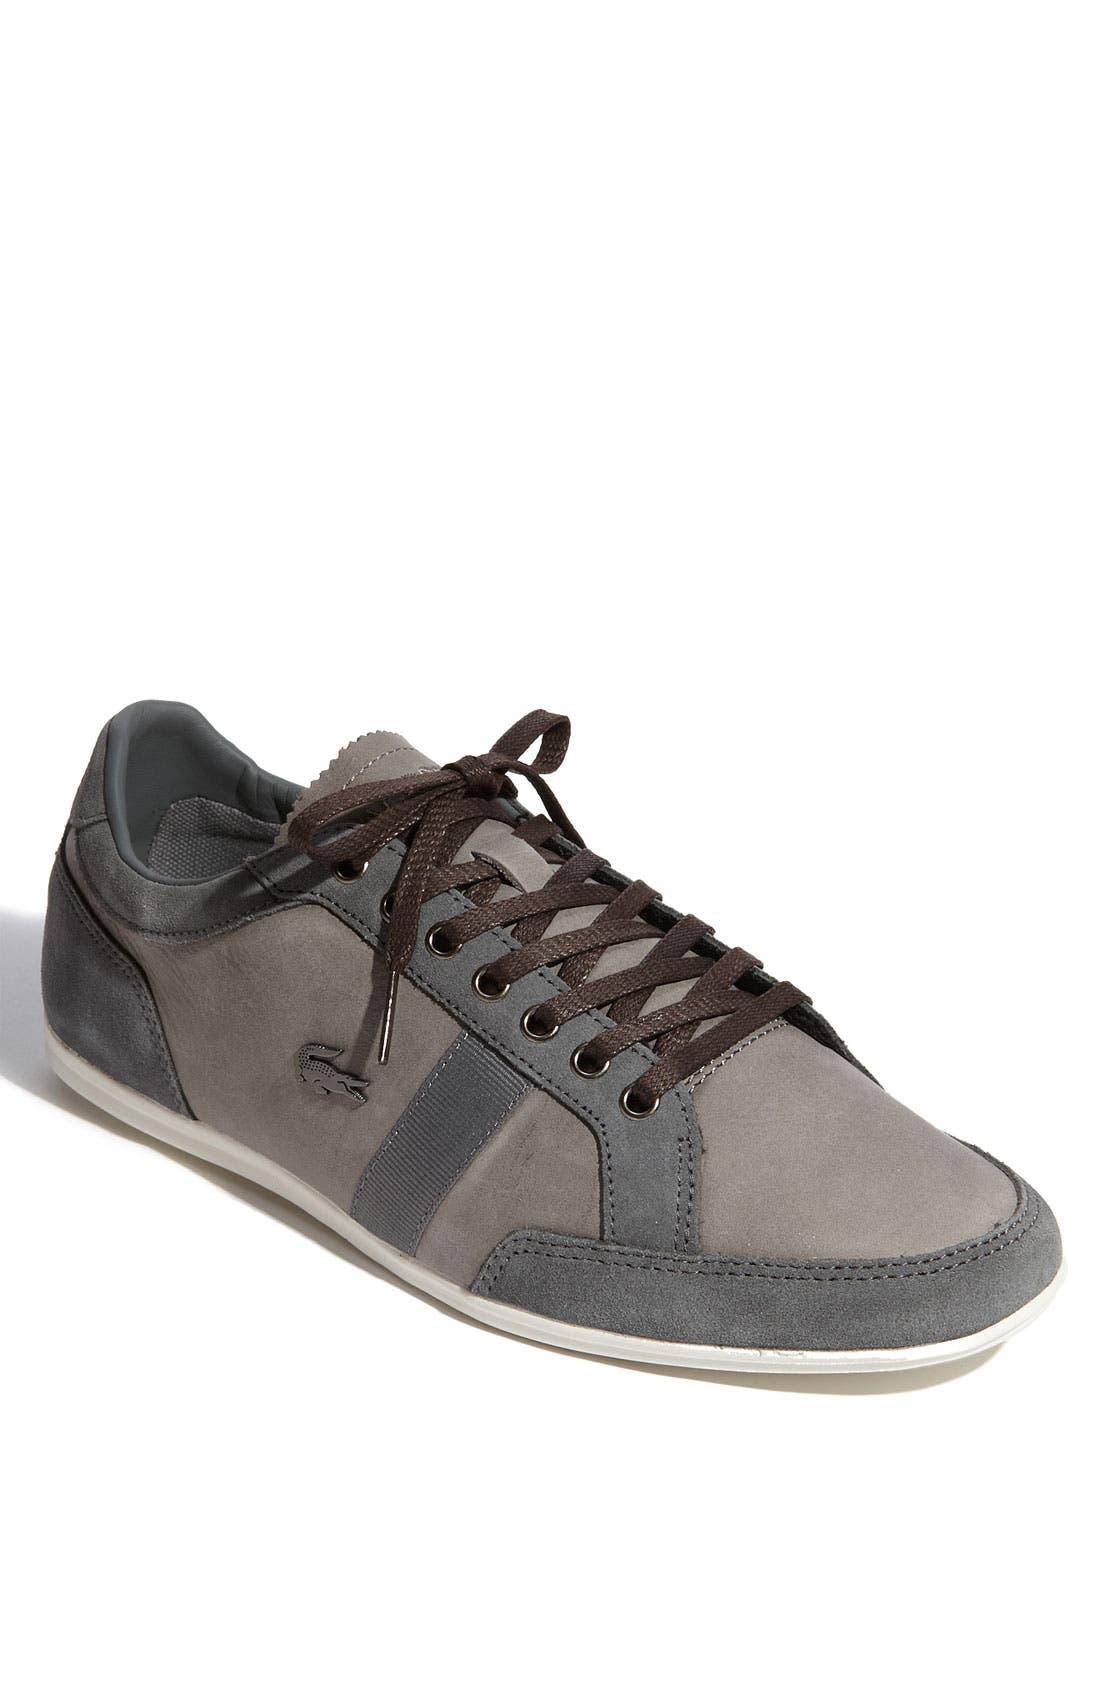 Main Image - Lacoste 'Alisos' Sneaker